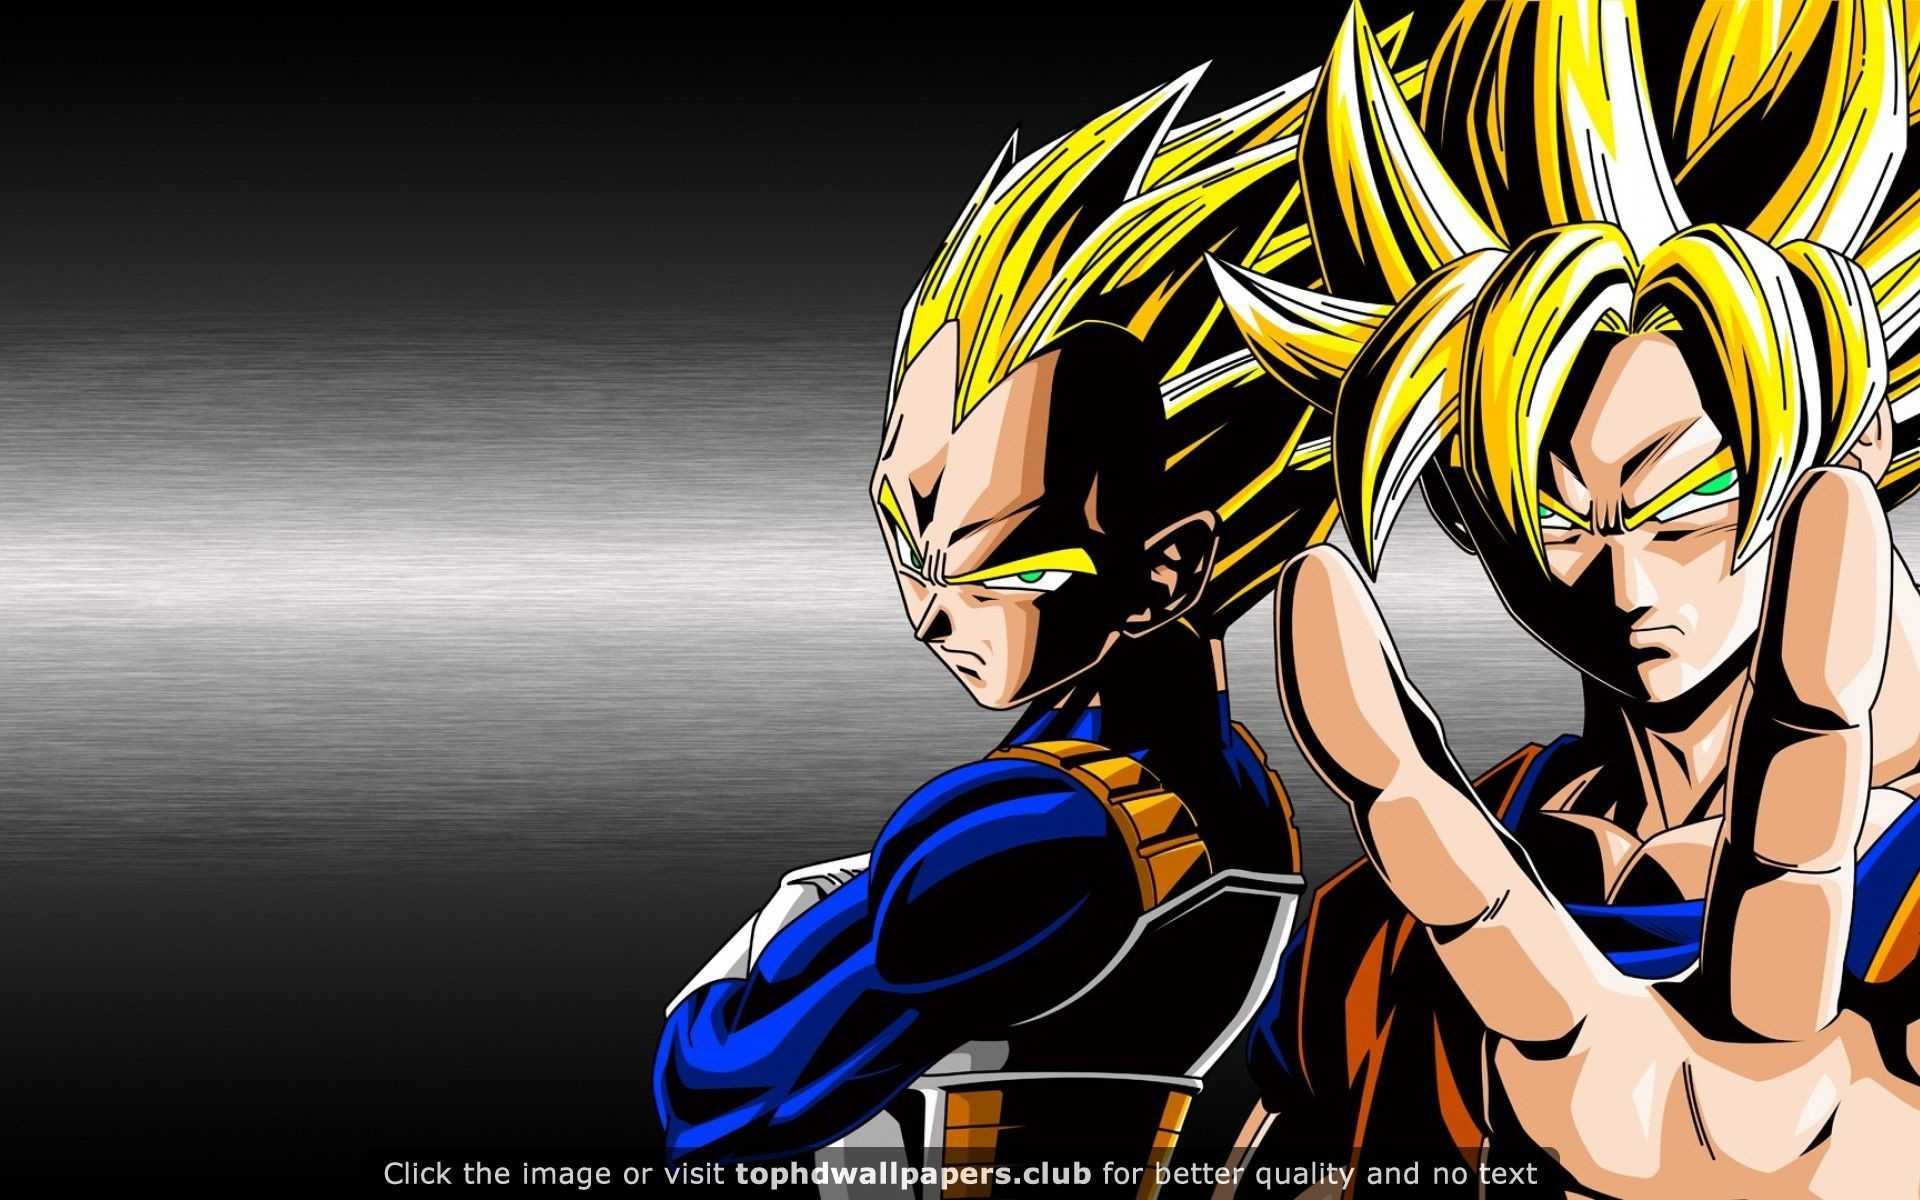 Dragon Ball Z Goku And Vegeta 4K or HD wallpaper for your PC, Mac .